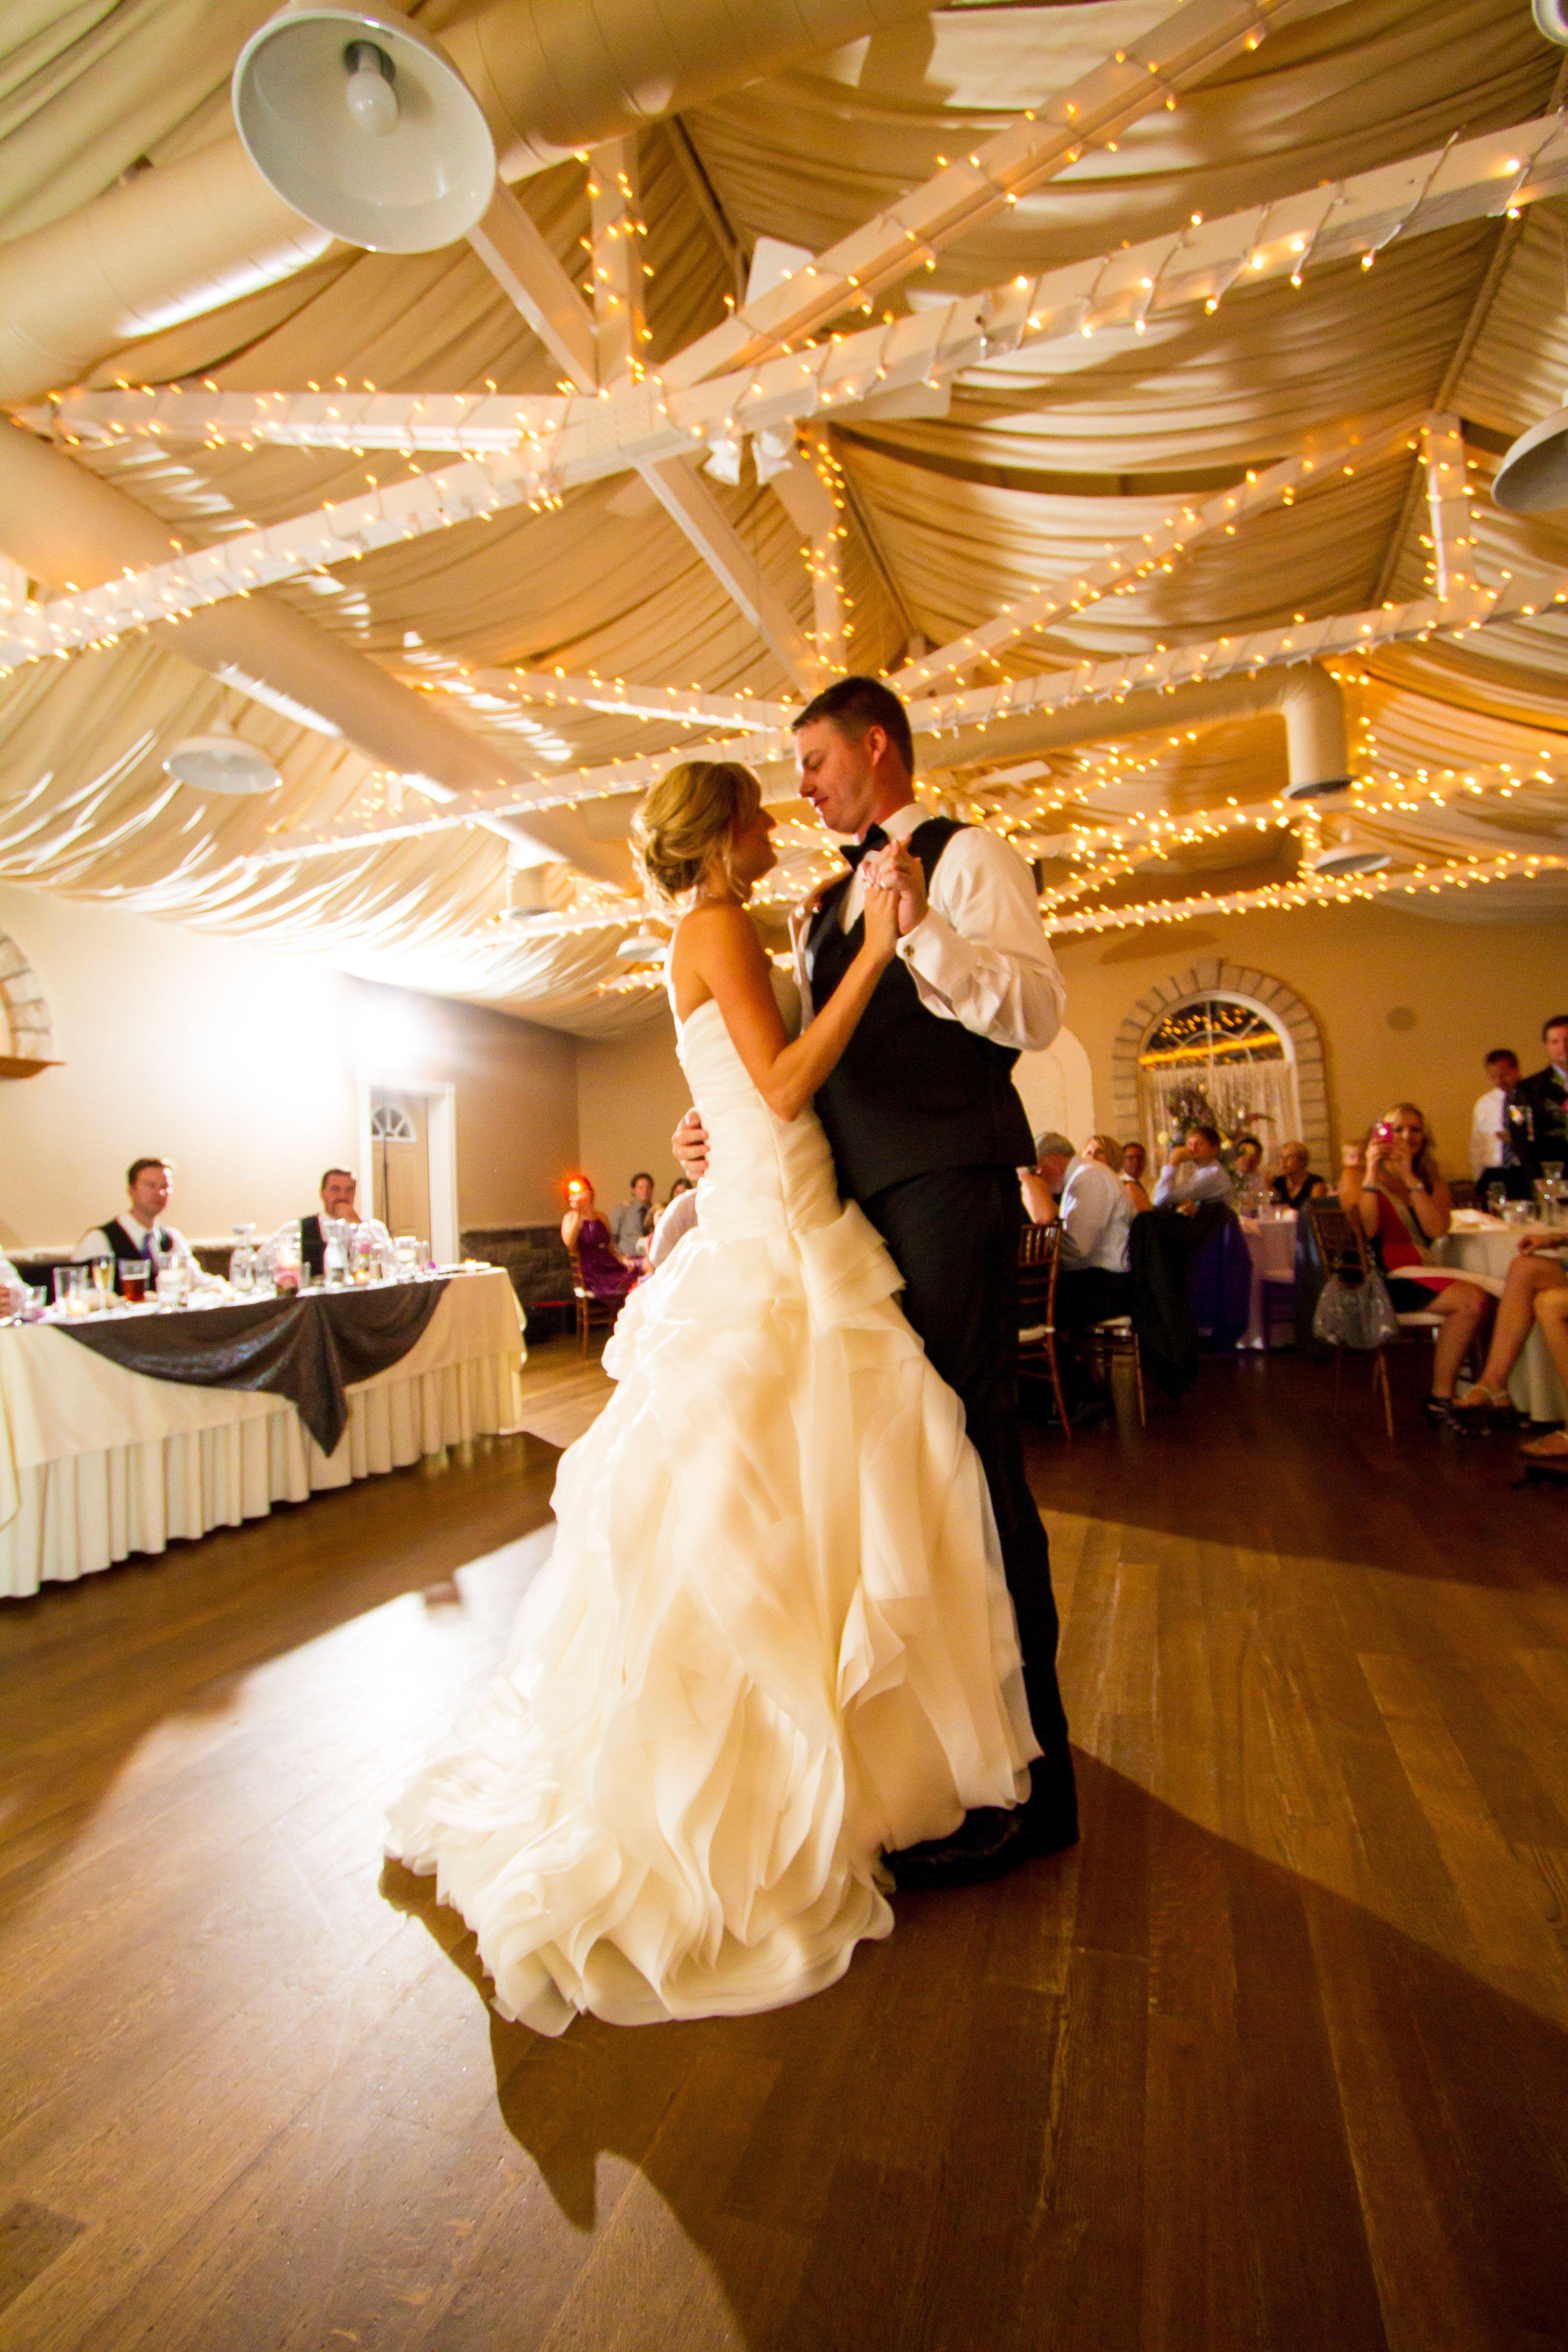 #newlyweds #brideandgroom #firstdance